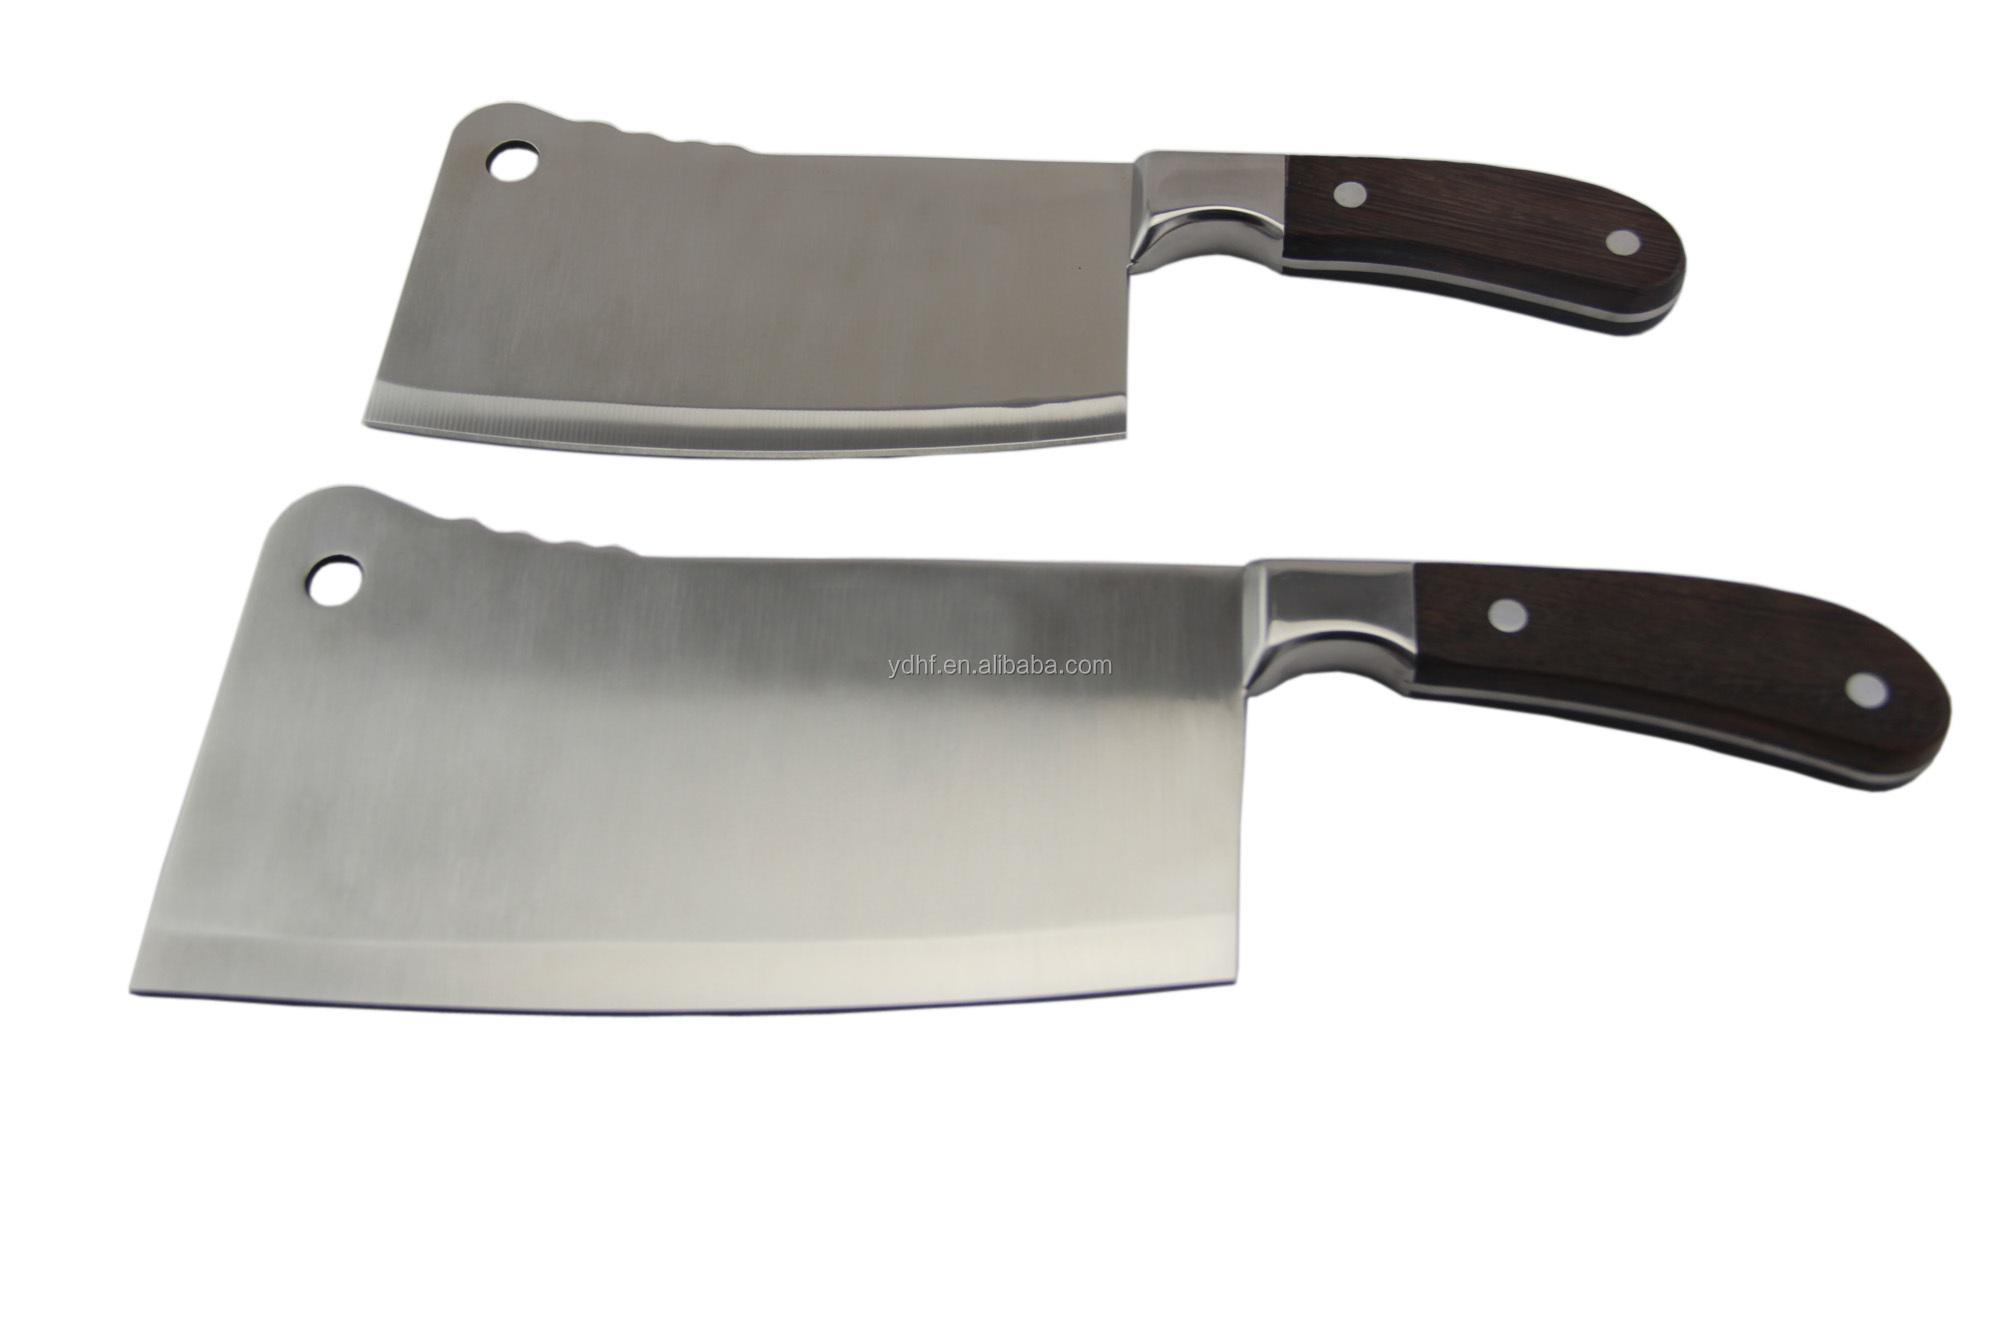 Wooden Handle Chopper Knife Chinese Knife Set Butcher